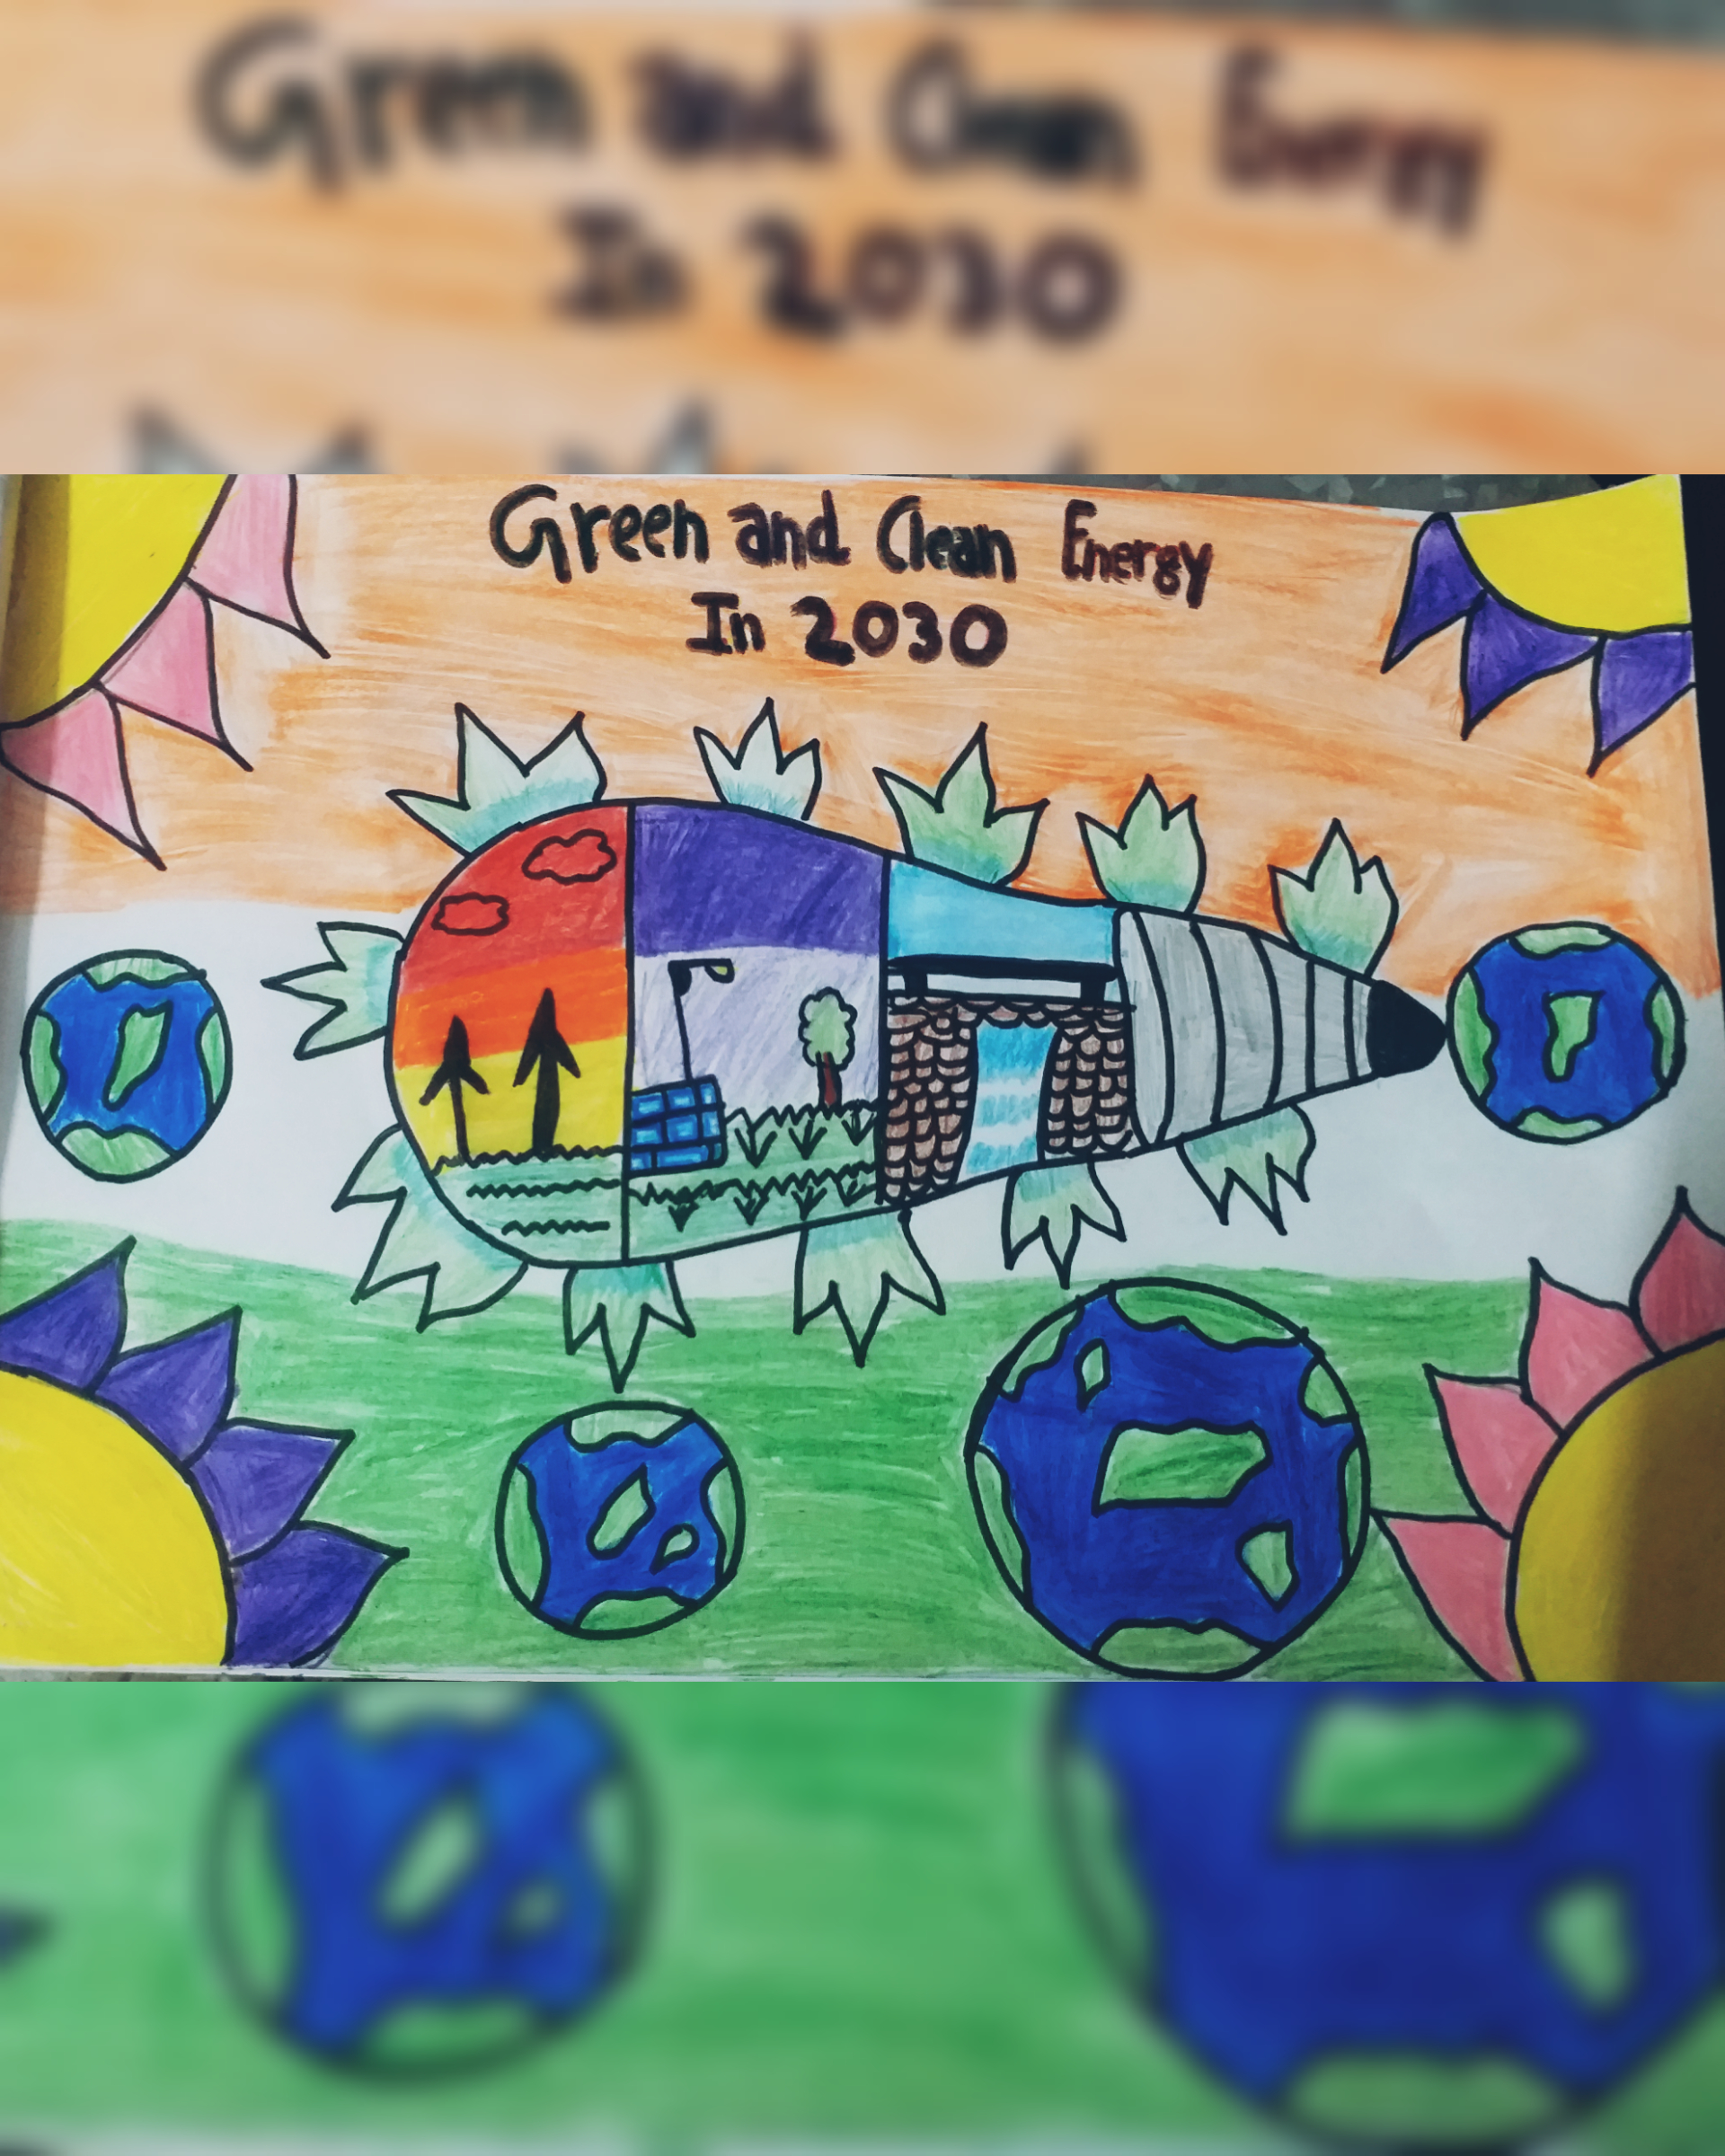 Alisha's Poster On 'Clean Energy'